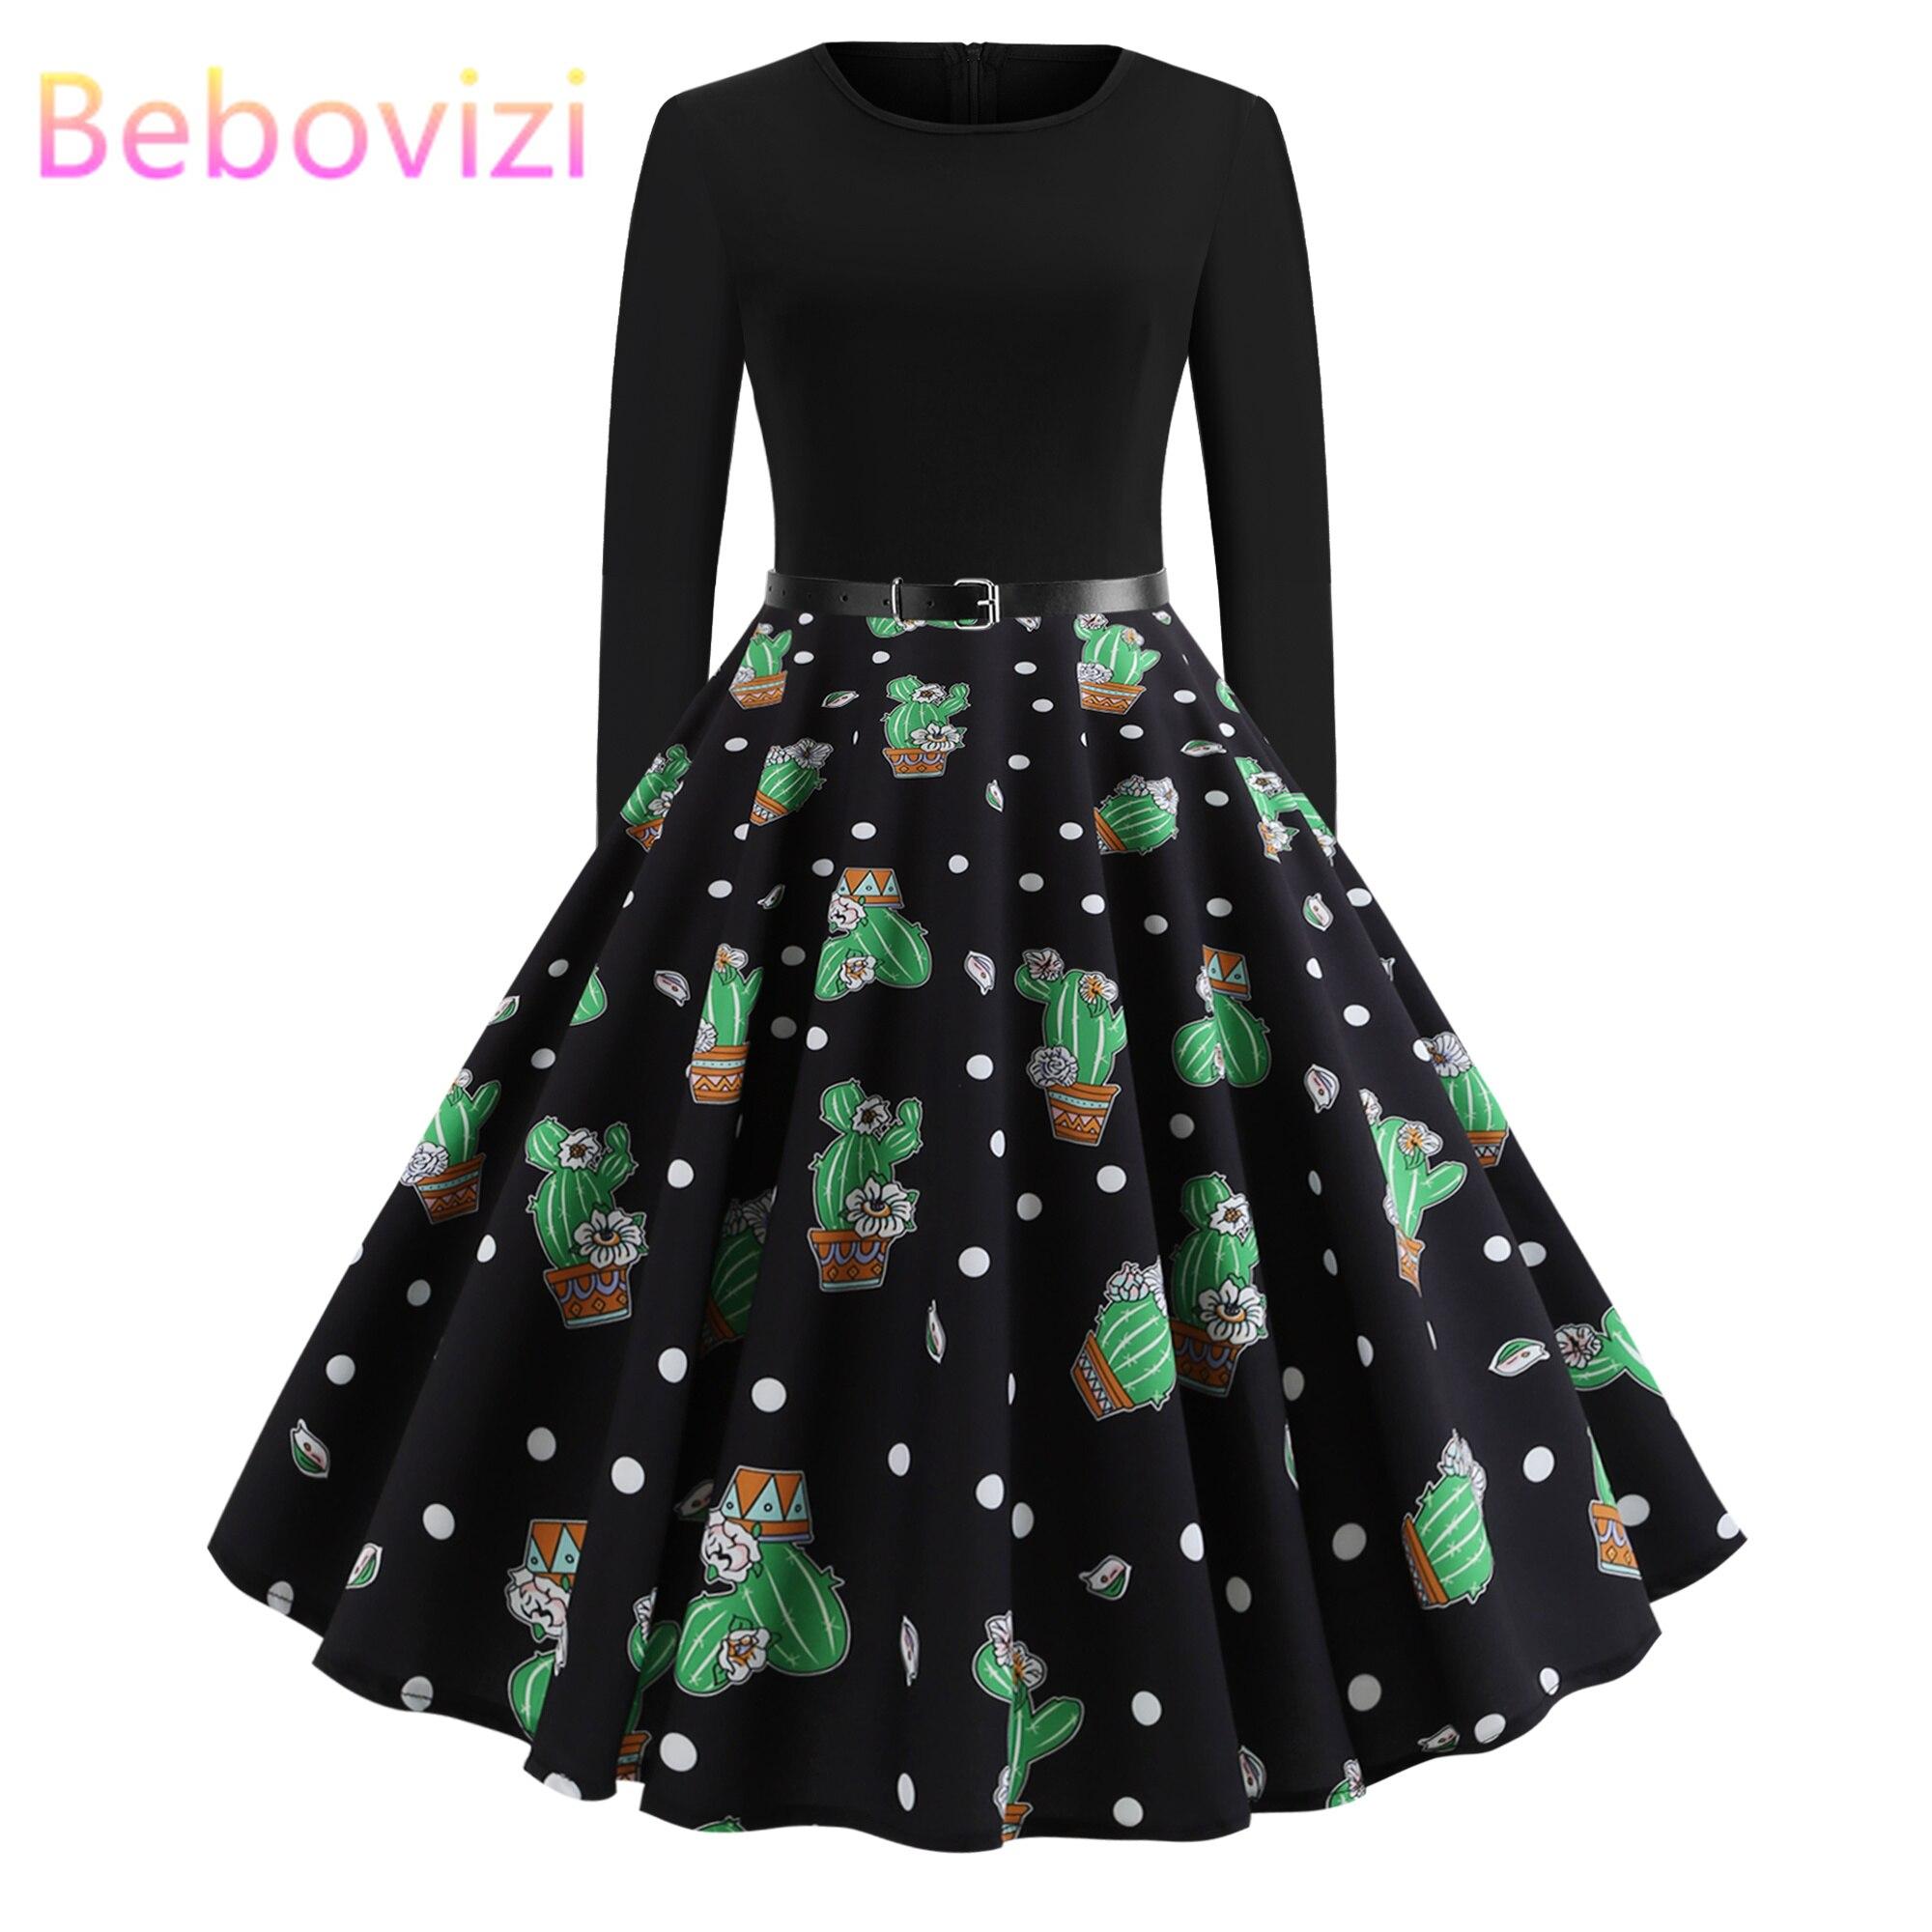 3cb9e92ec WSUOWE Dress Fashion Elegant Women Summer Dresses Casual Sweet Print  Cartoon Dress Party Slim Dress Robe ...